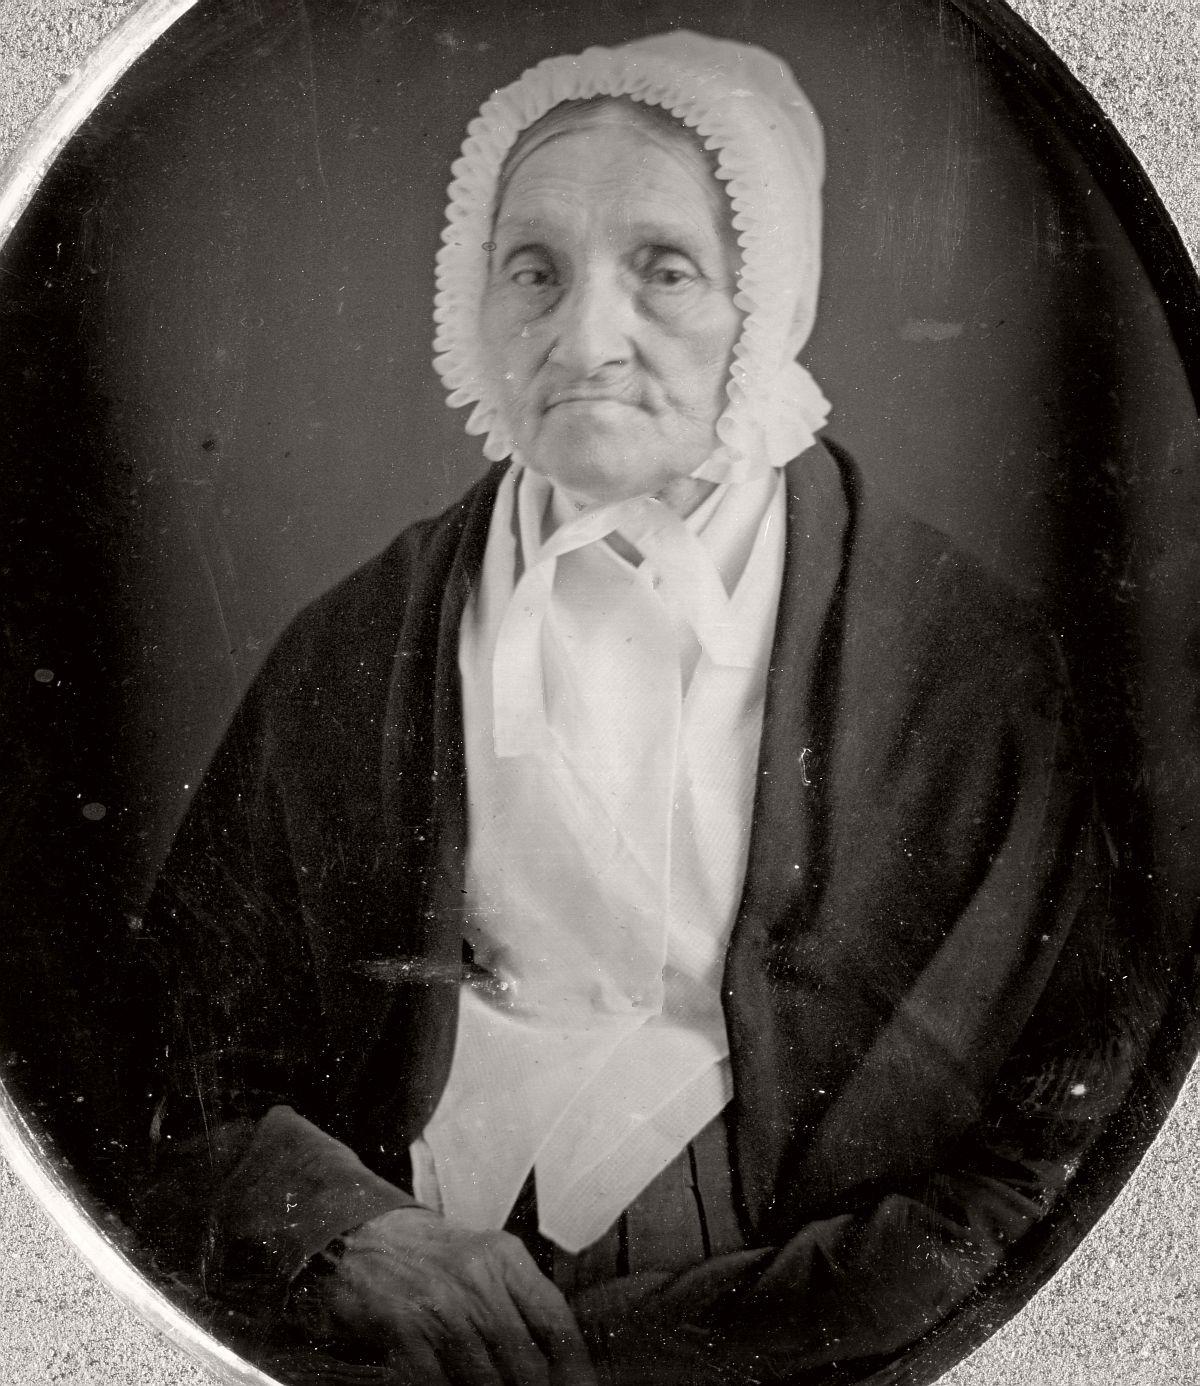 daguerreotype-portrait-ladies-born-in-the-late-18th-century-1700s-vintage-09